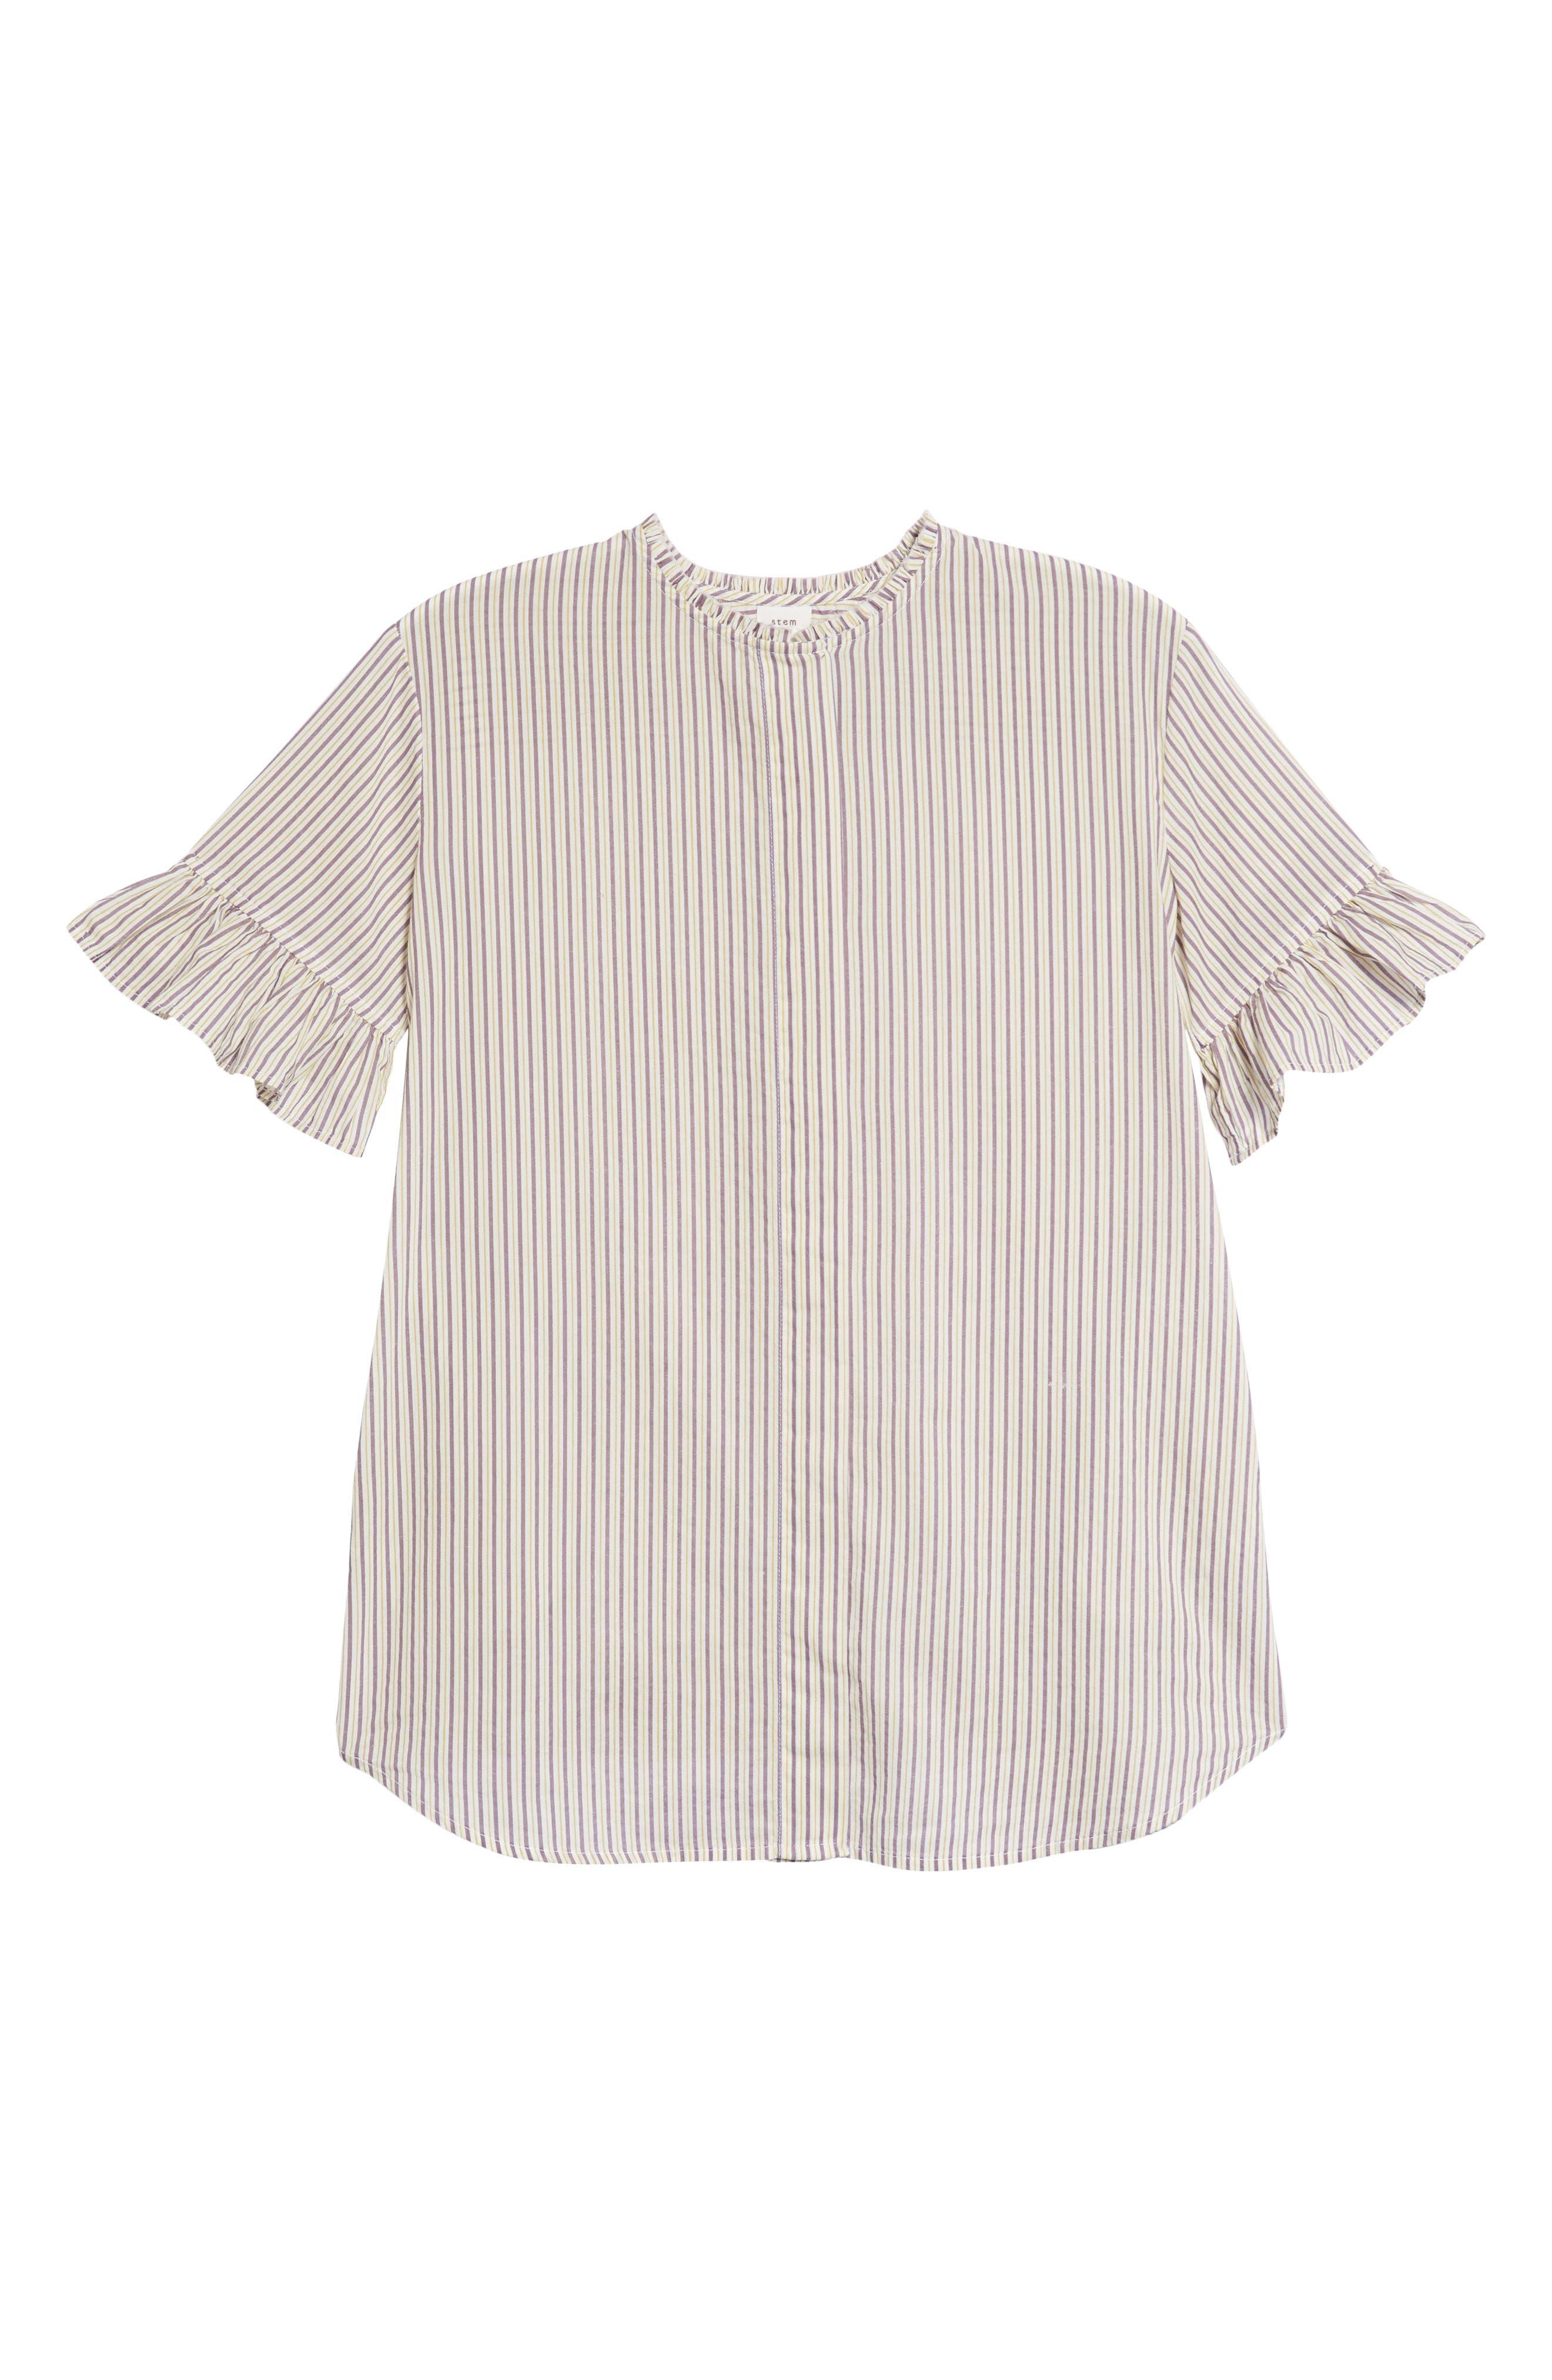 Ruffle Stripe Shirtdress,                         Main,                         color, White Multi Stripe